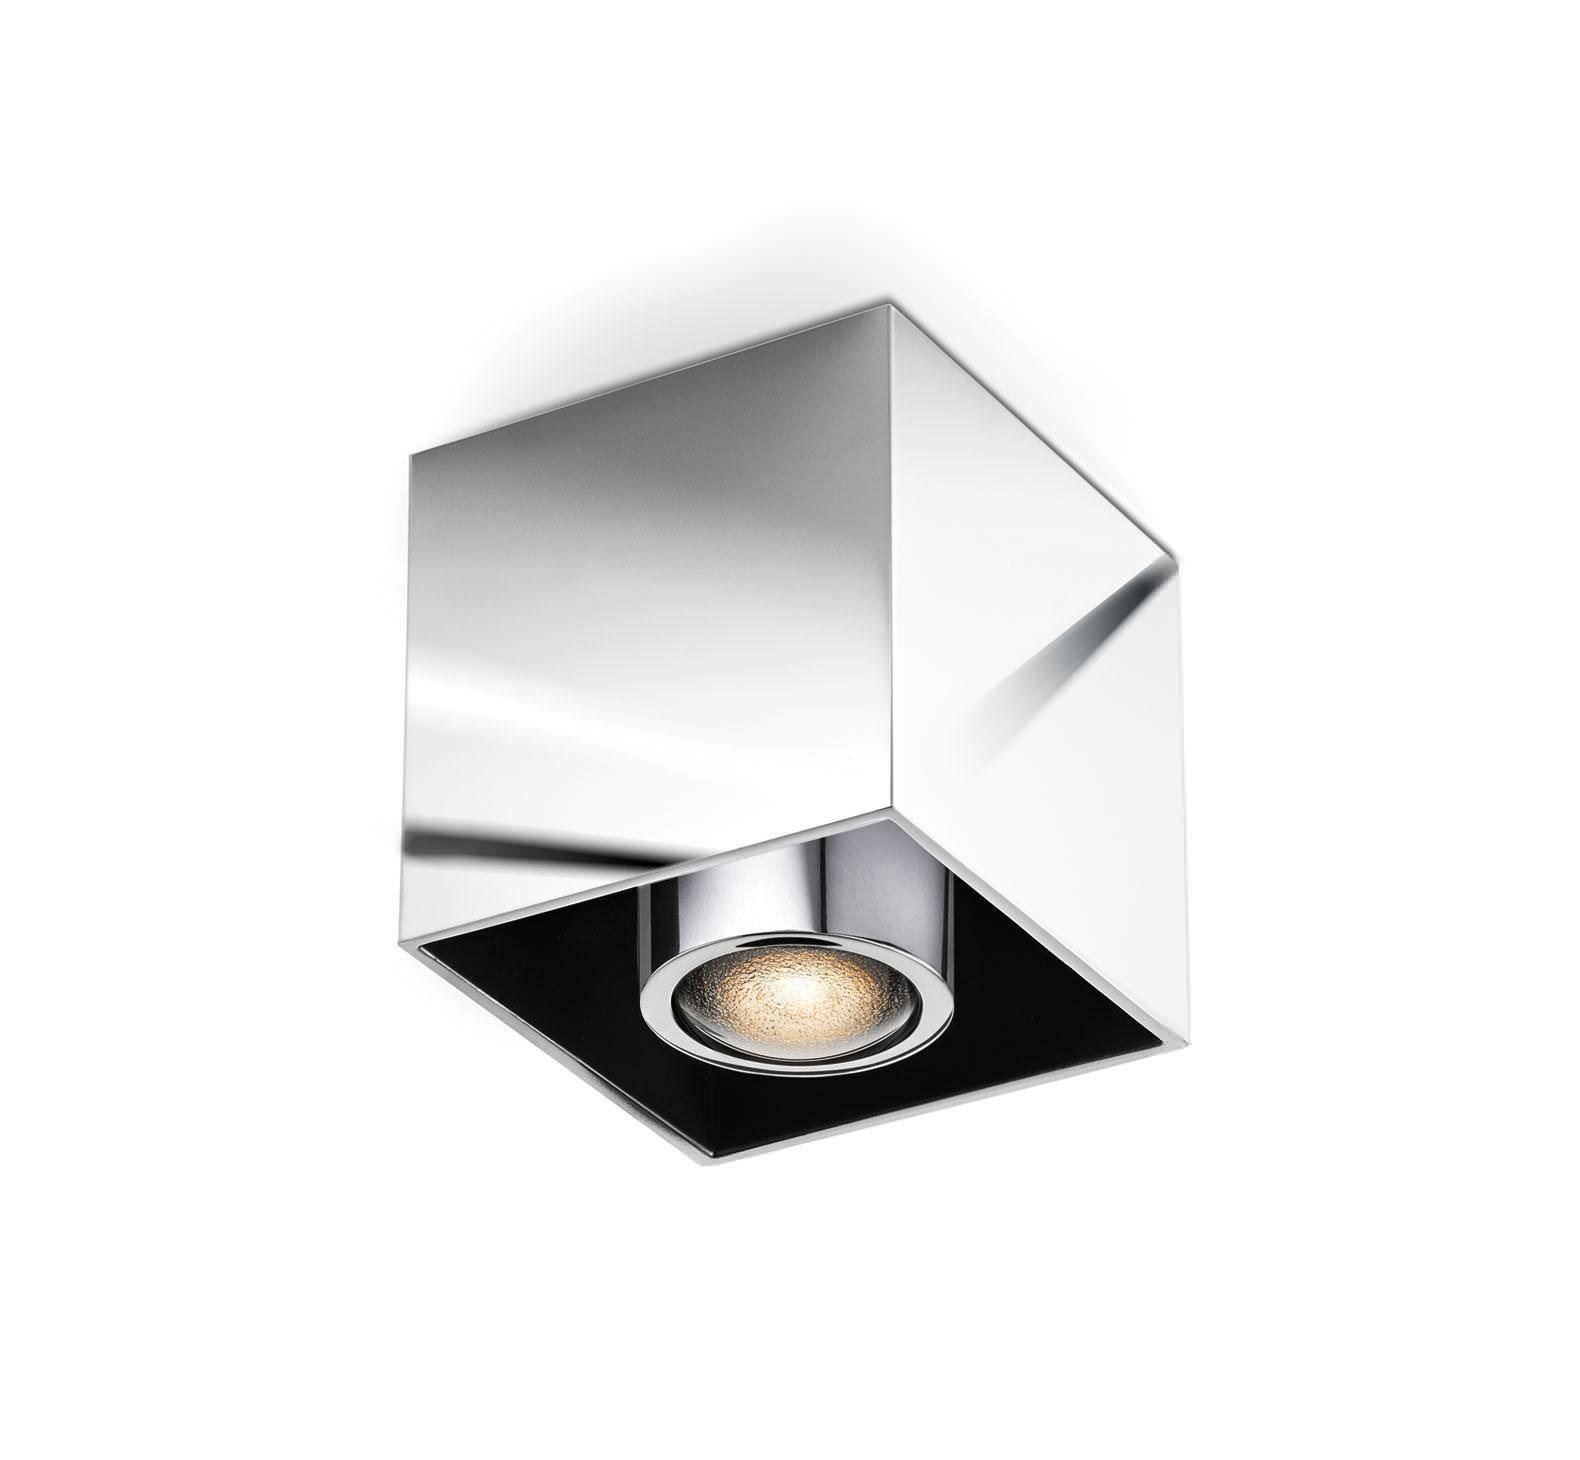 Ceiling-mounted spotlight / indoor / LED / square - CRANNY : MONO C ... for Ceiling Spot Light Square  35fsj